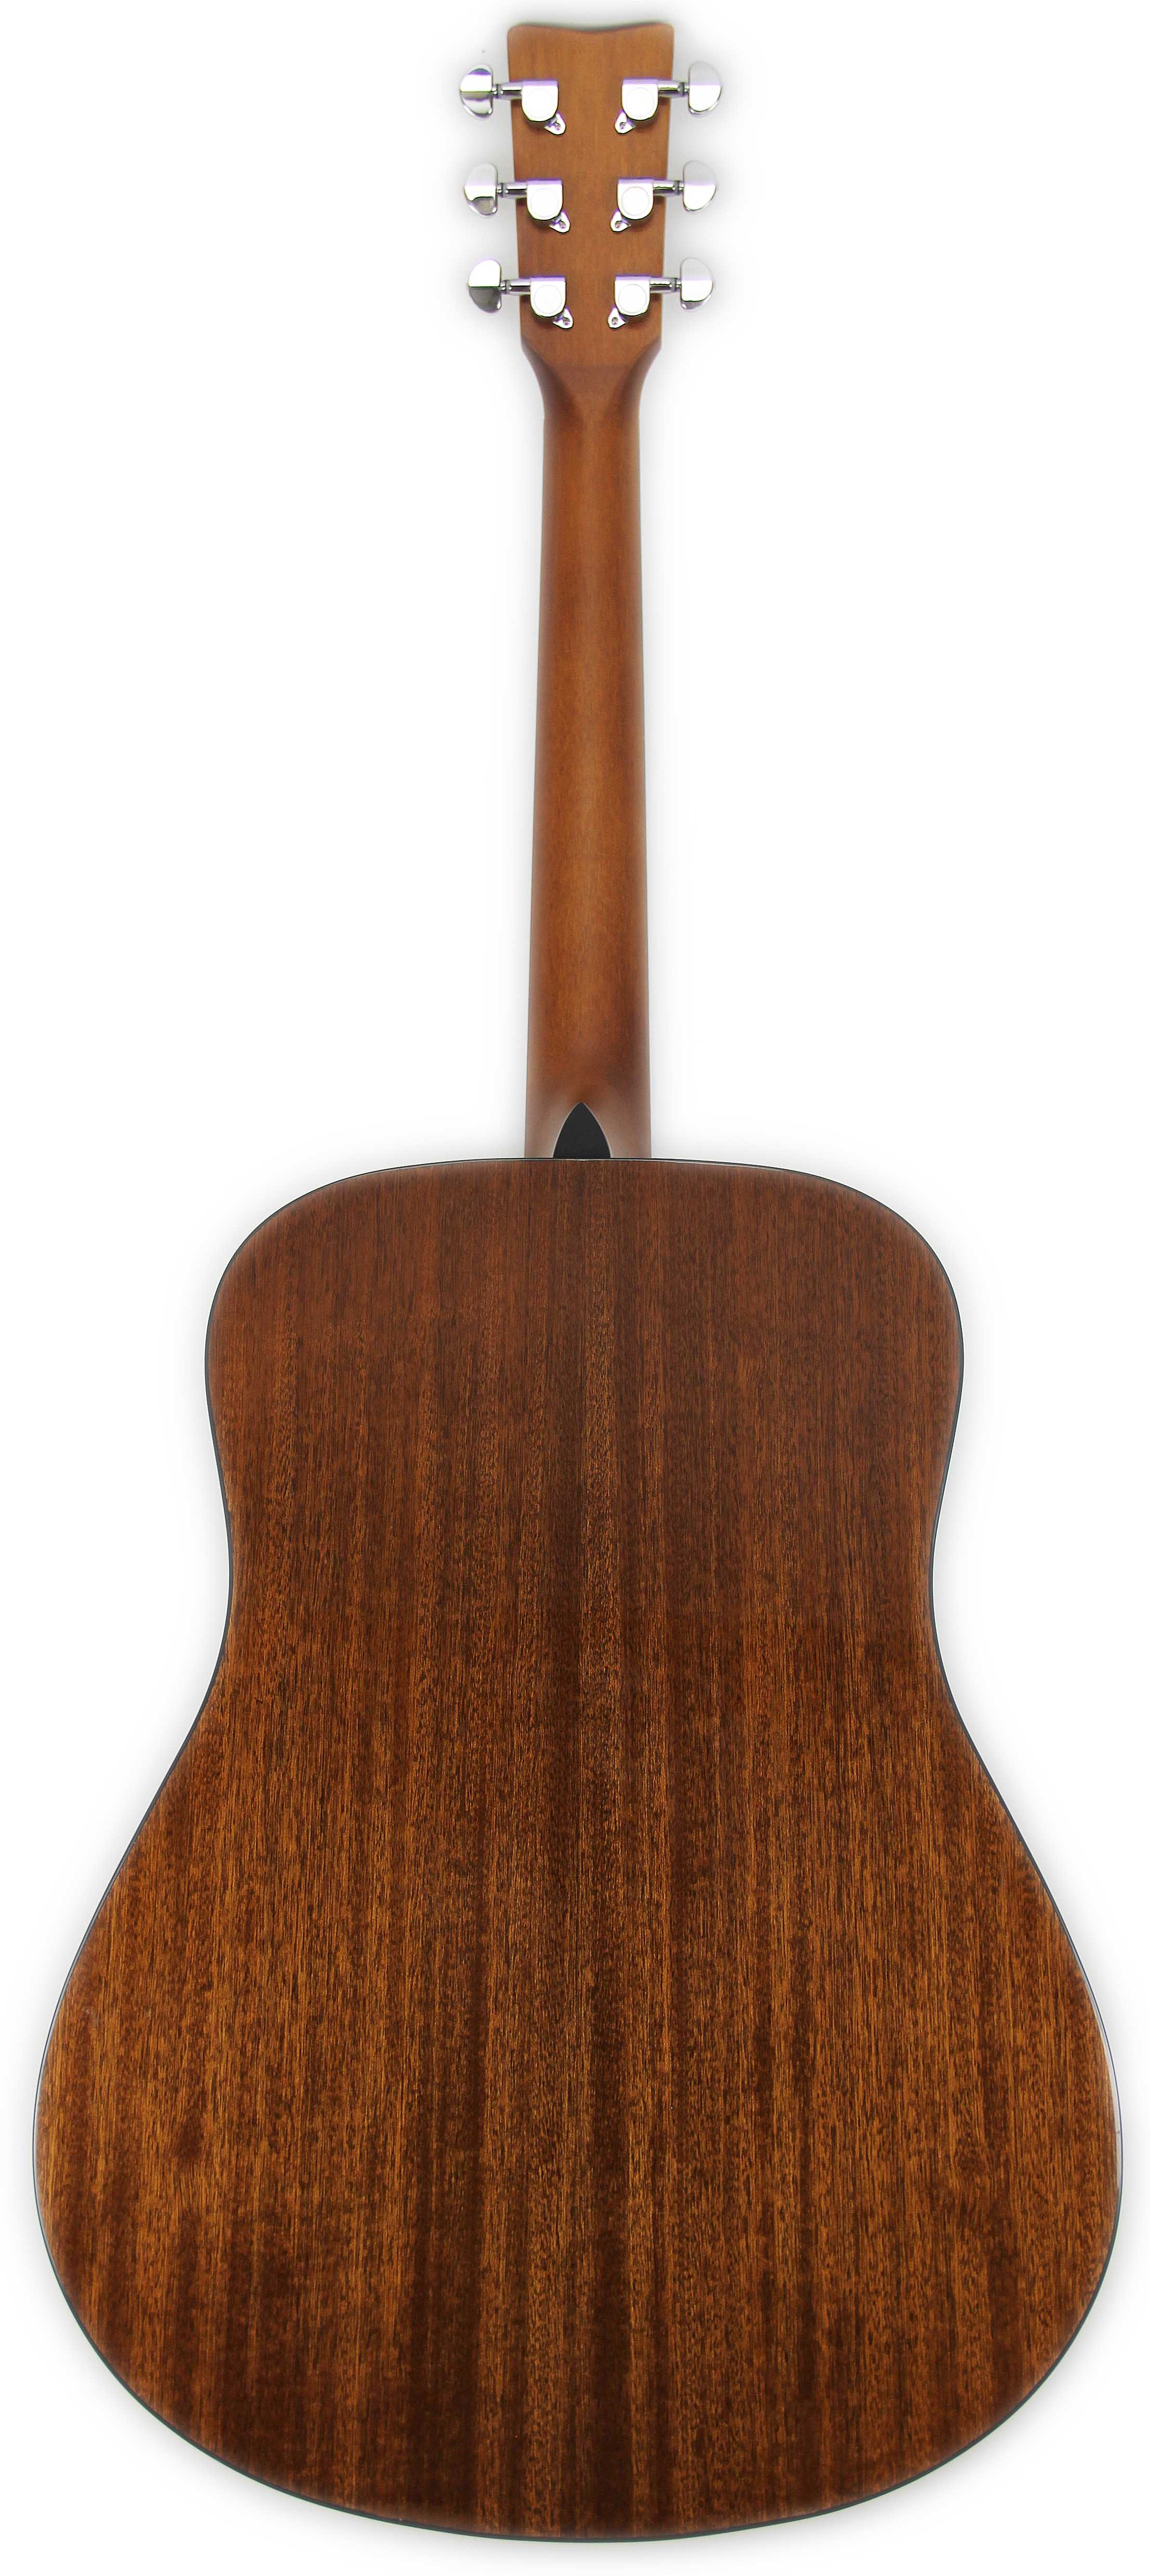 yamaha f325d dreadnought acoustic guitar natural w hard case ebay. Black Bedroom Furniture Sets. Home Design Ideas